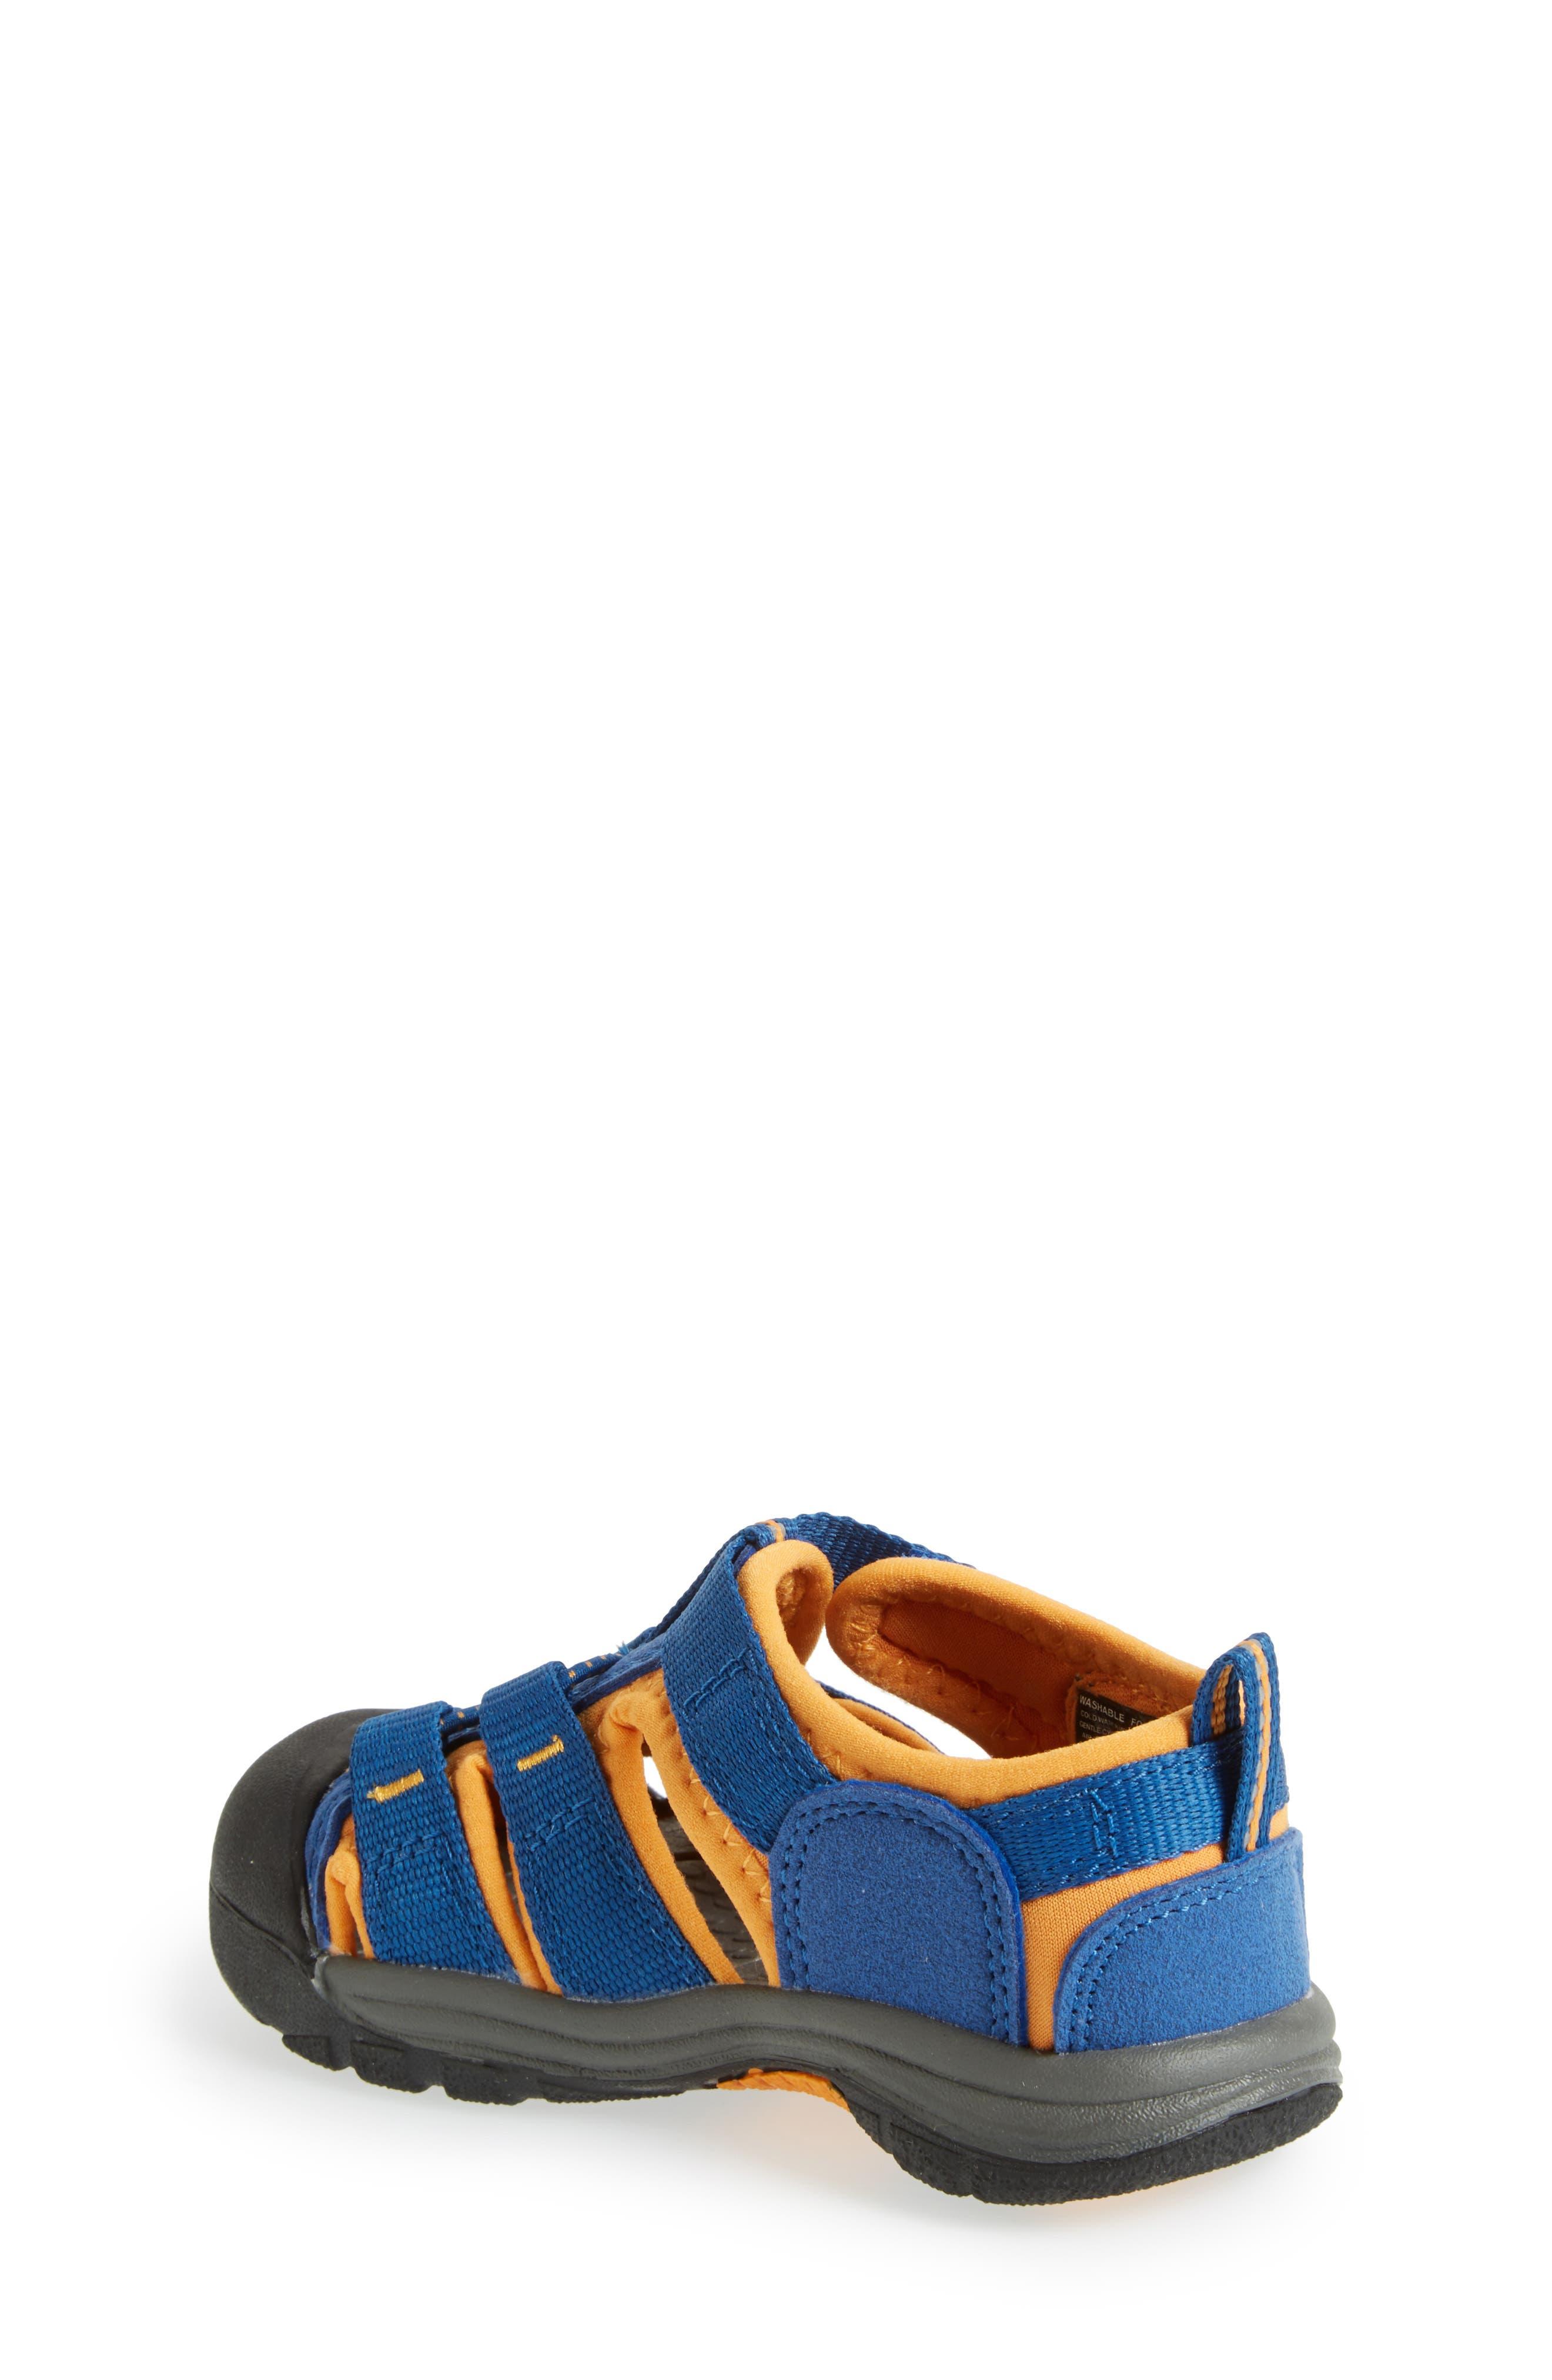 'Newport H2' Water Friendly Sandal,                             Alternate thumbnail 89, color,